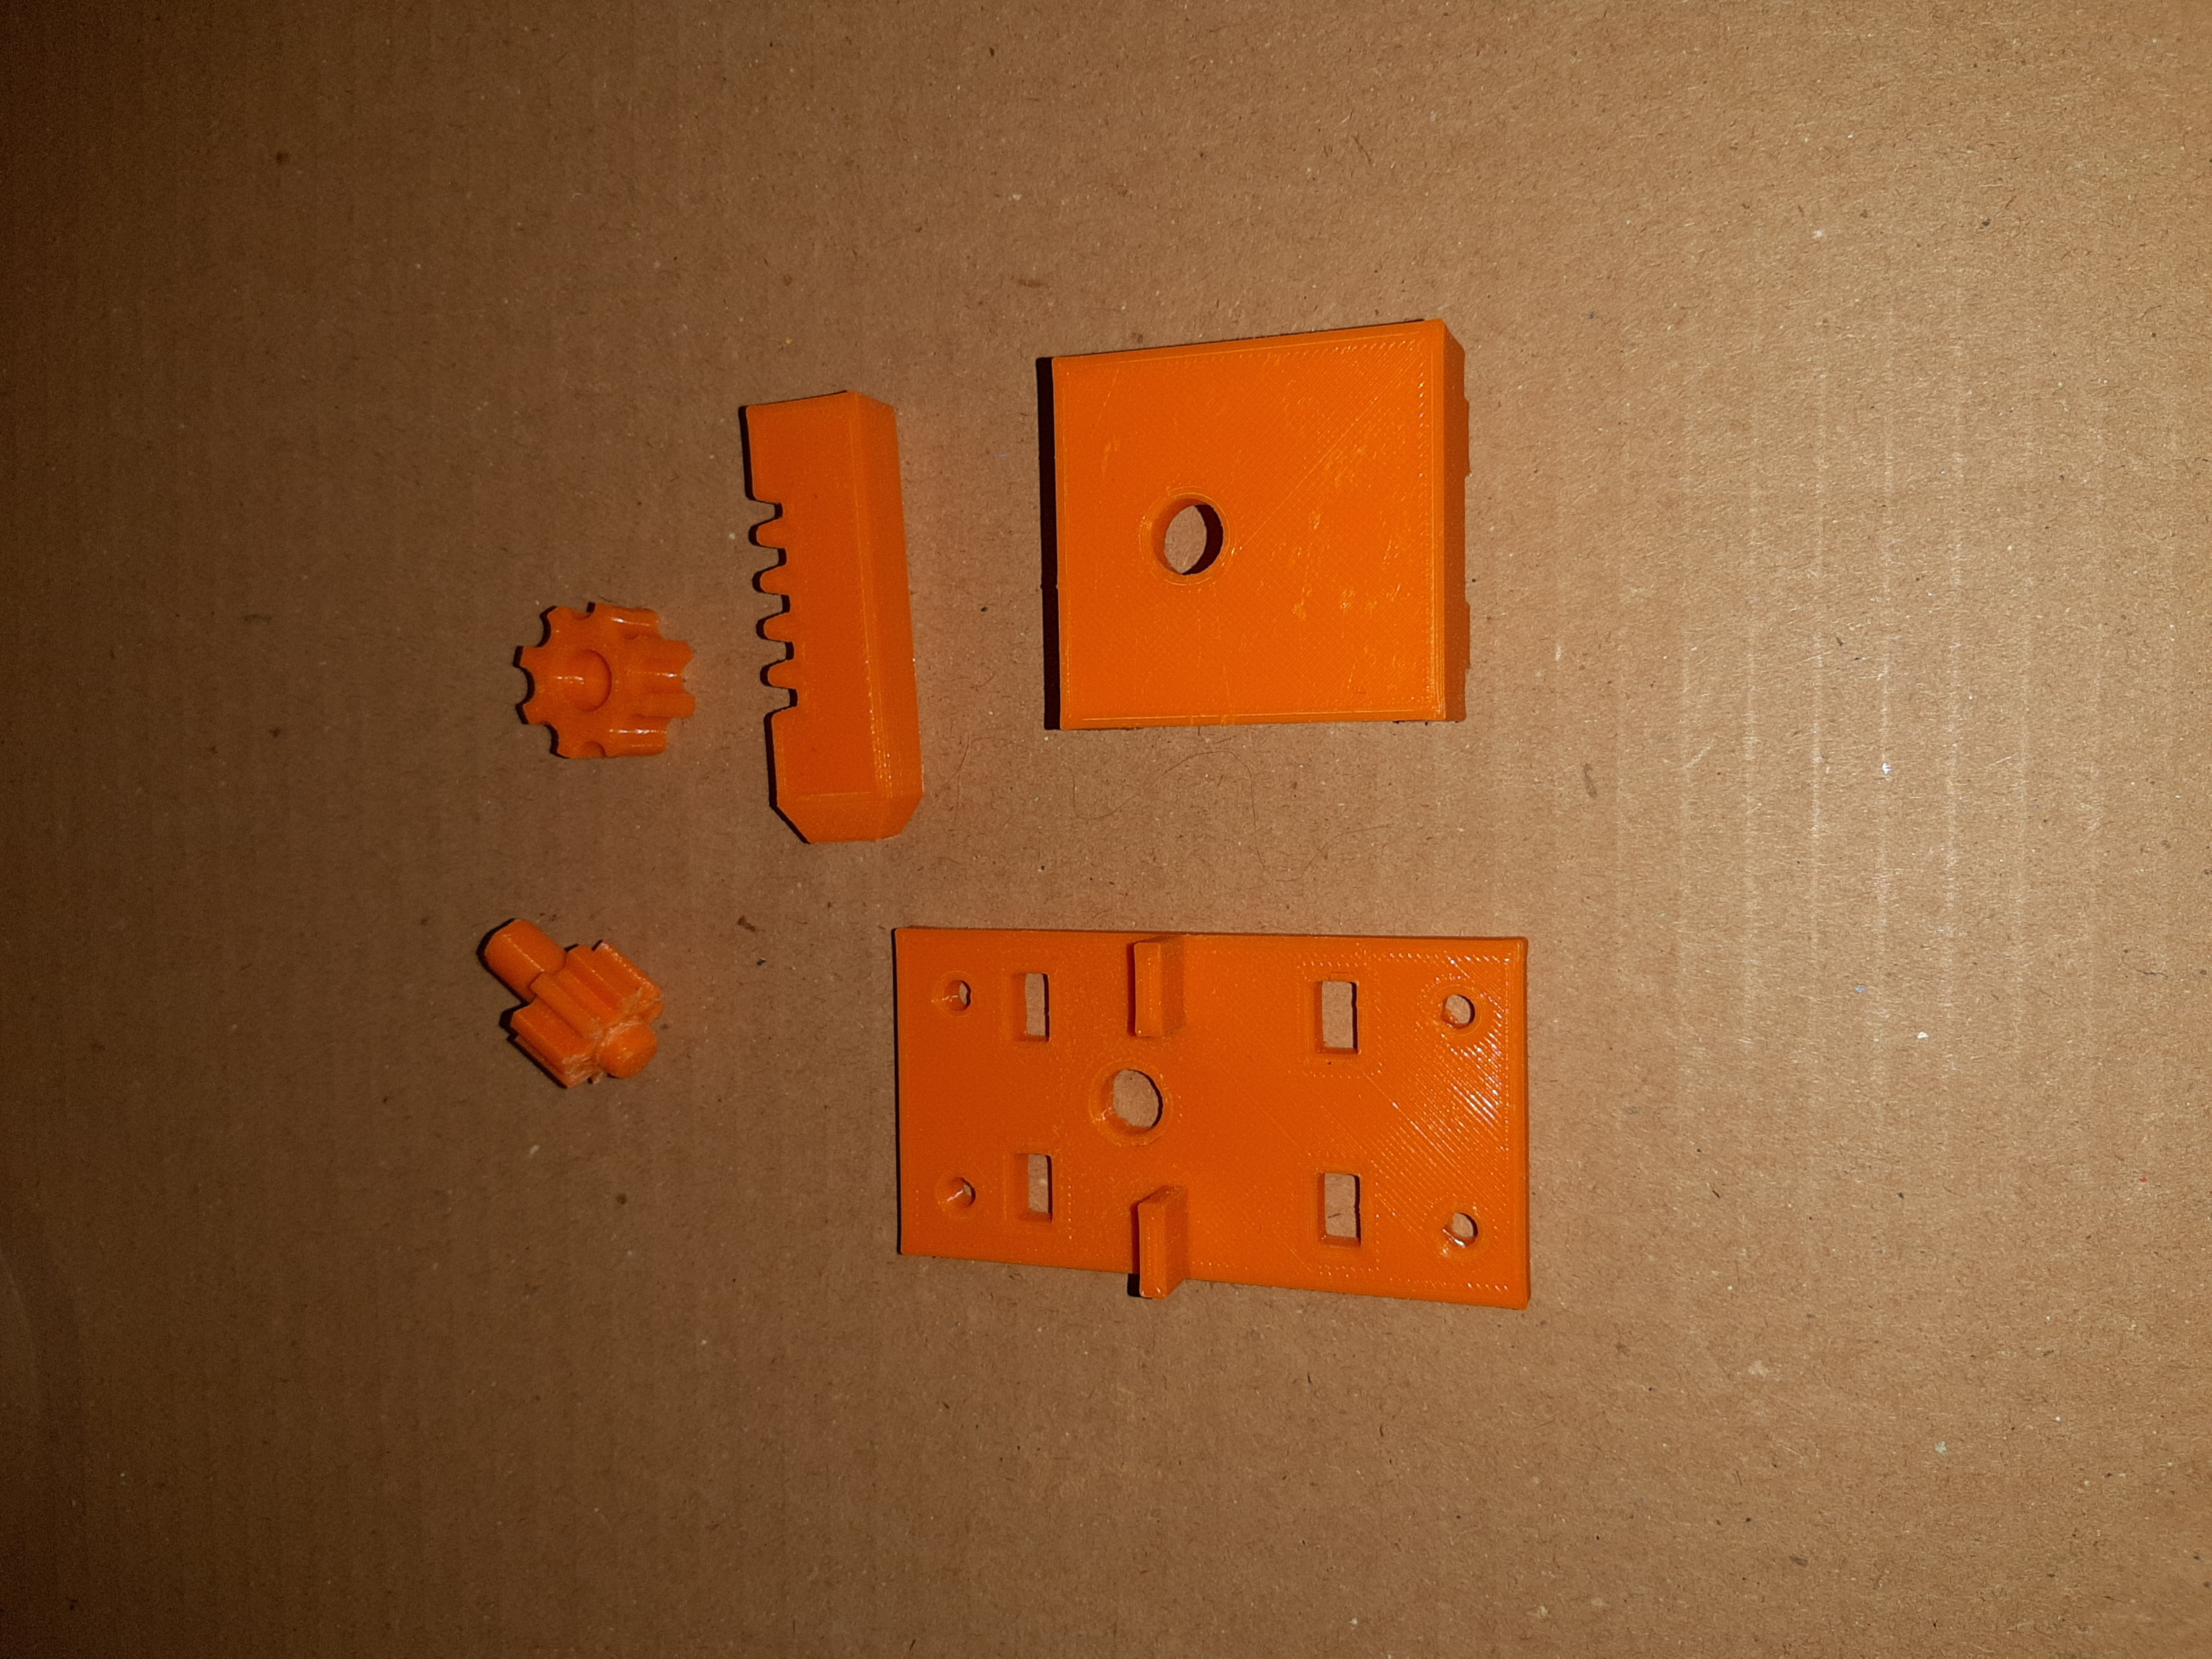 20200118_180109.jpg Download free STL file Lock • 3D printable template, modernliveiswar6